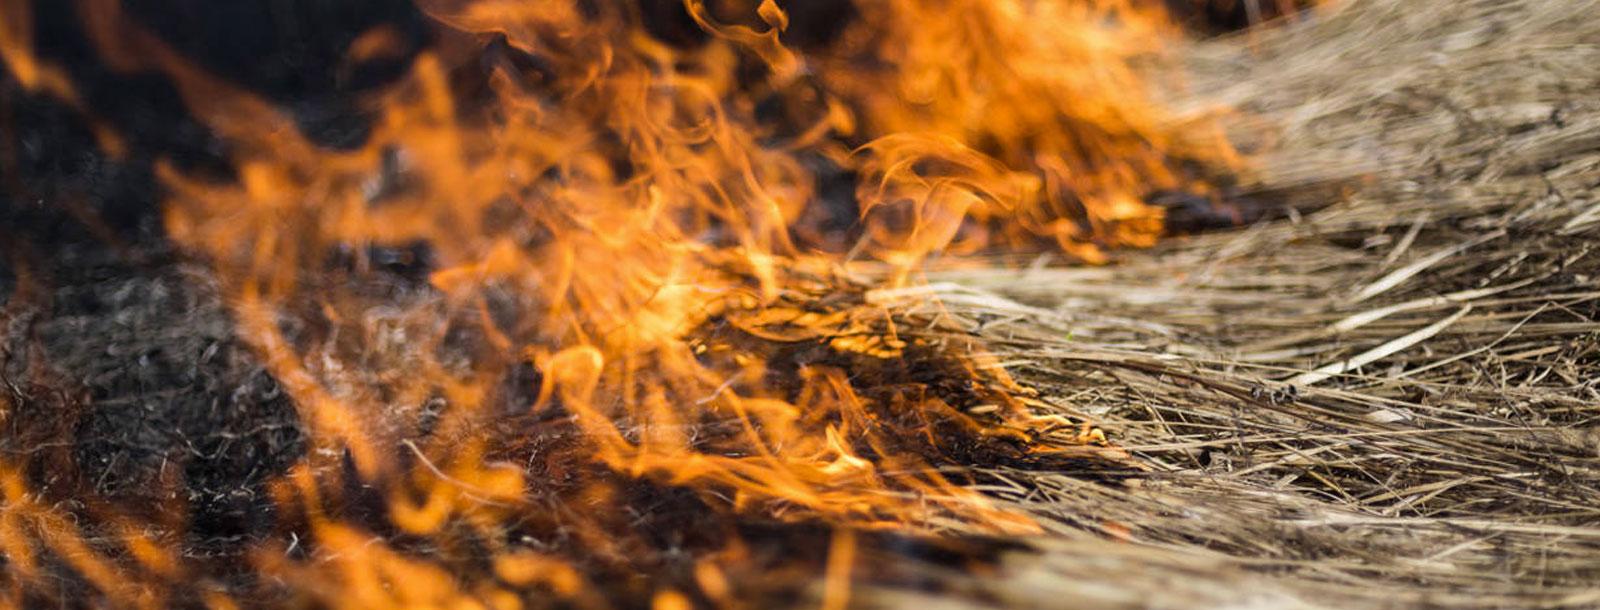 PuroPellet: Diez tips para prevenir incendios este verano